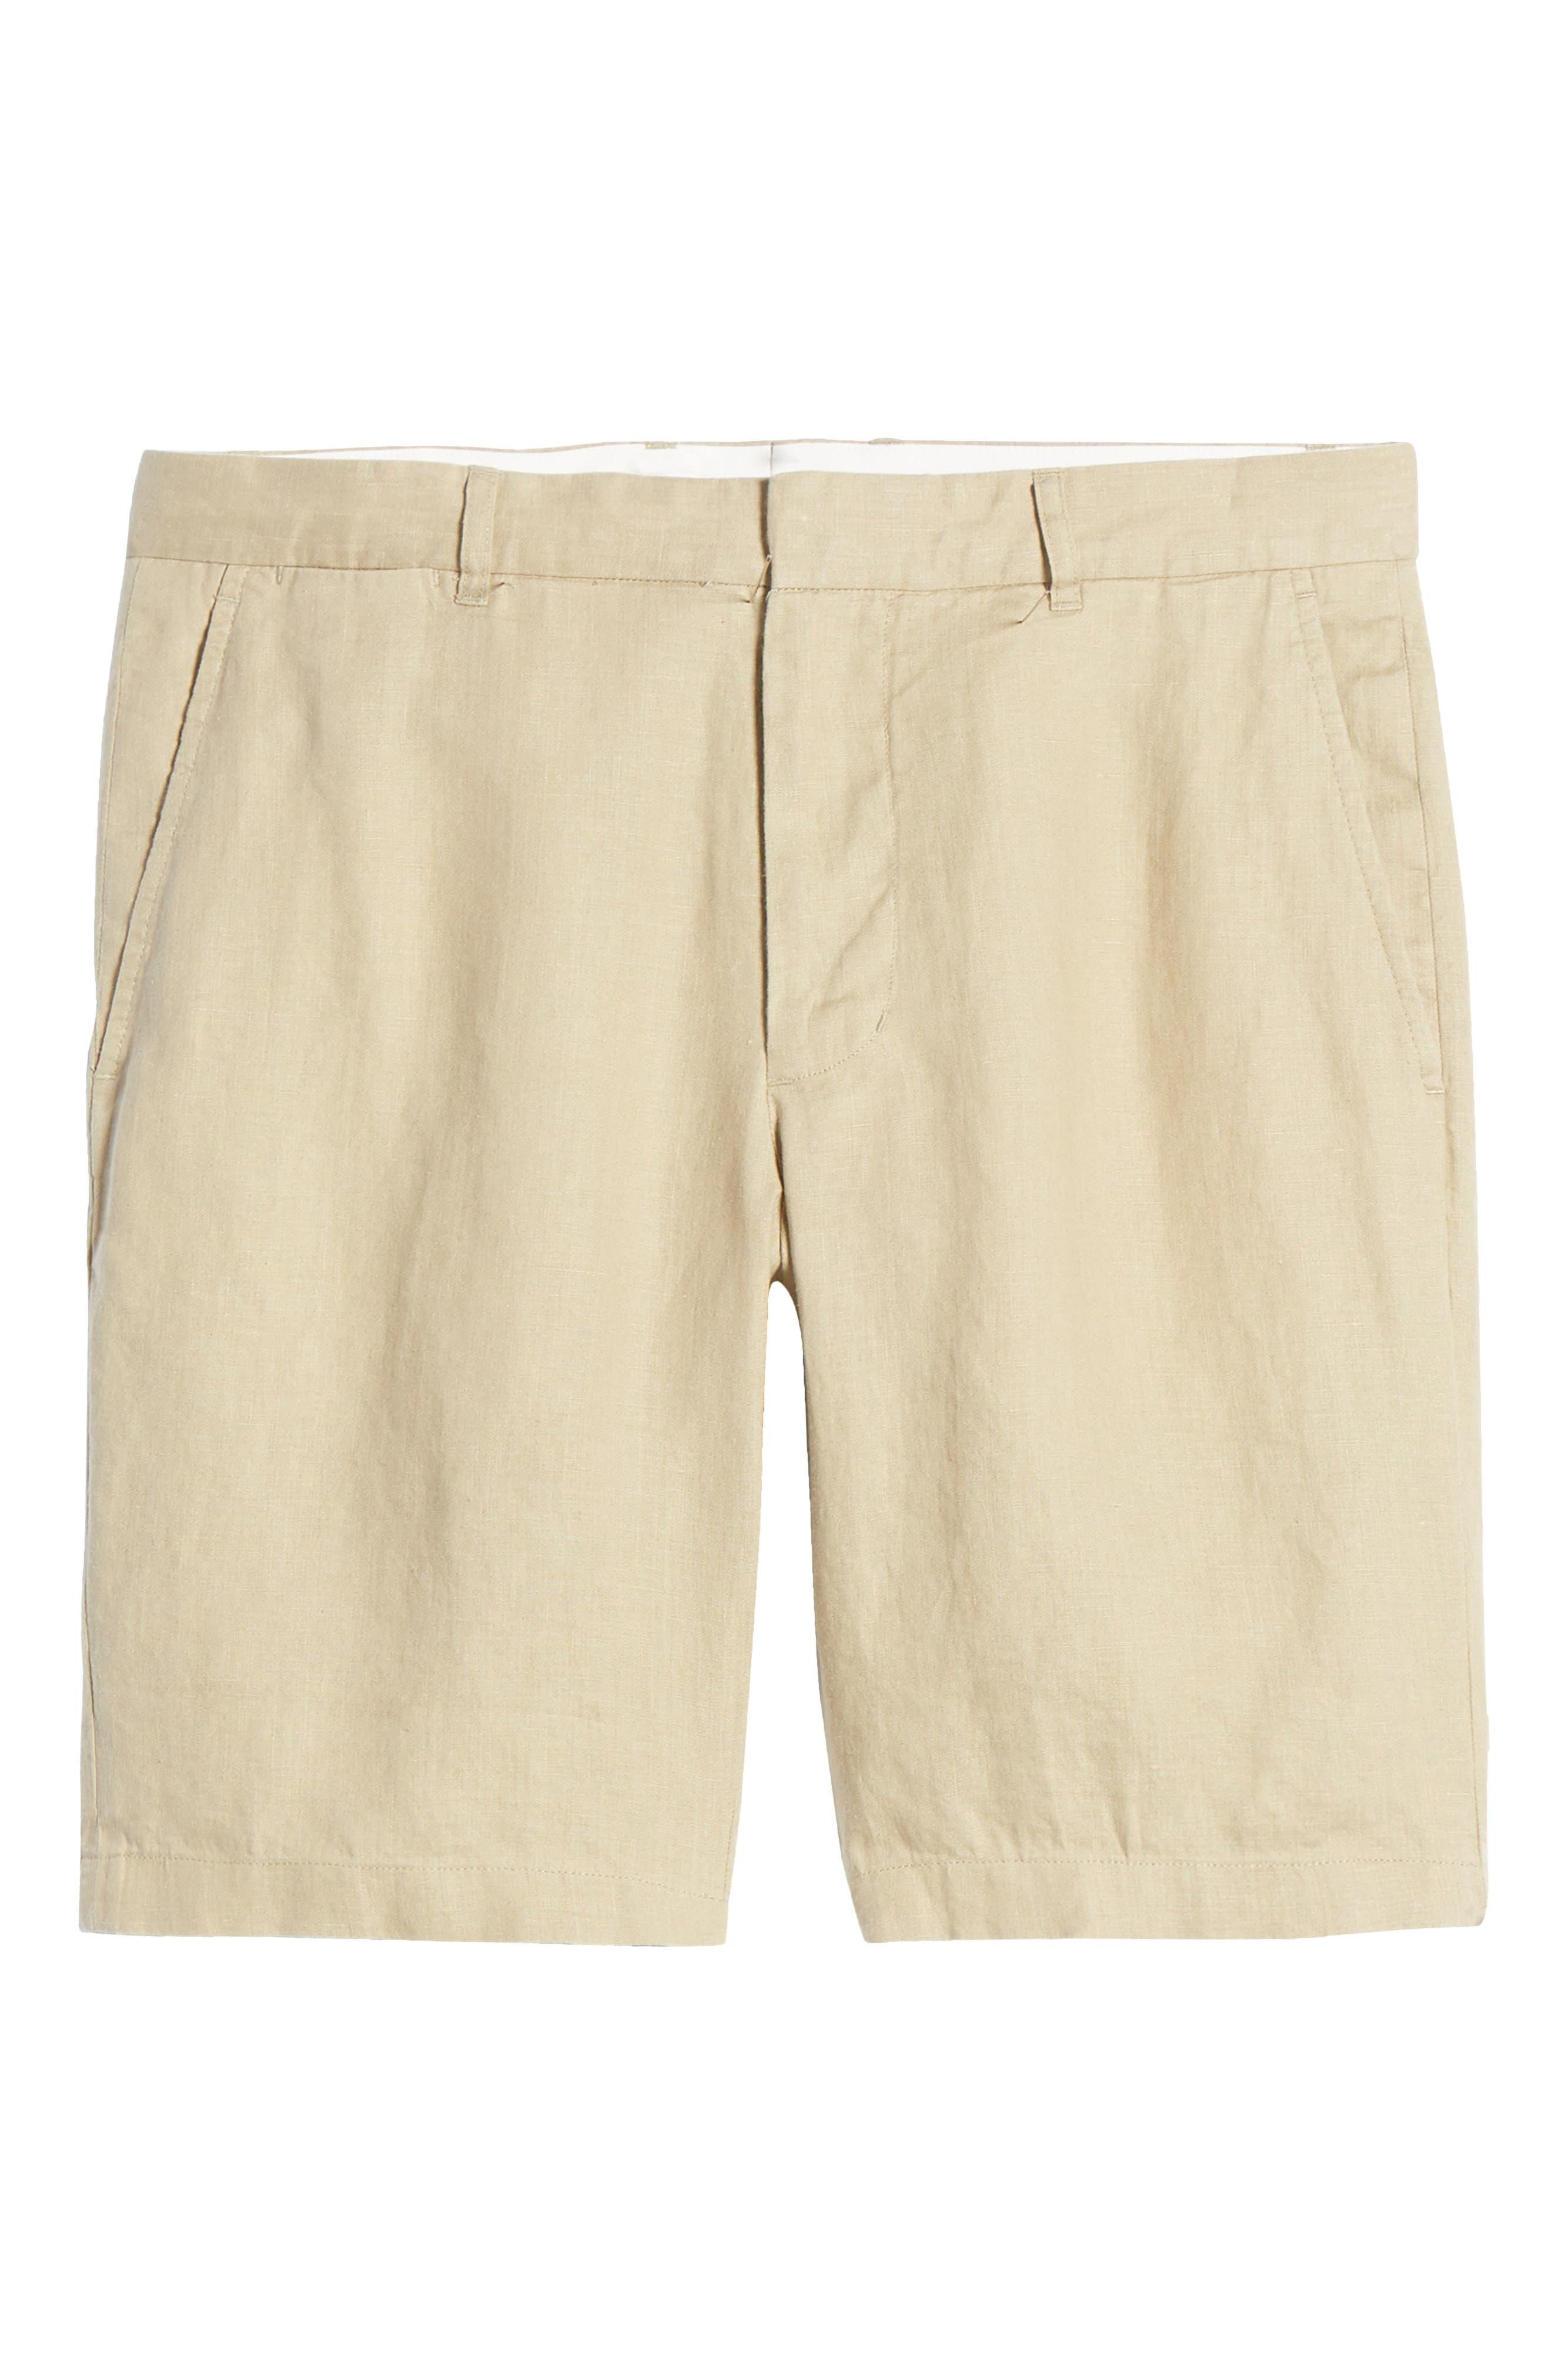 Image of Vince James Classic Slim Leg Hemp Shorts